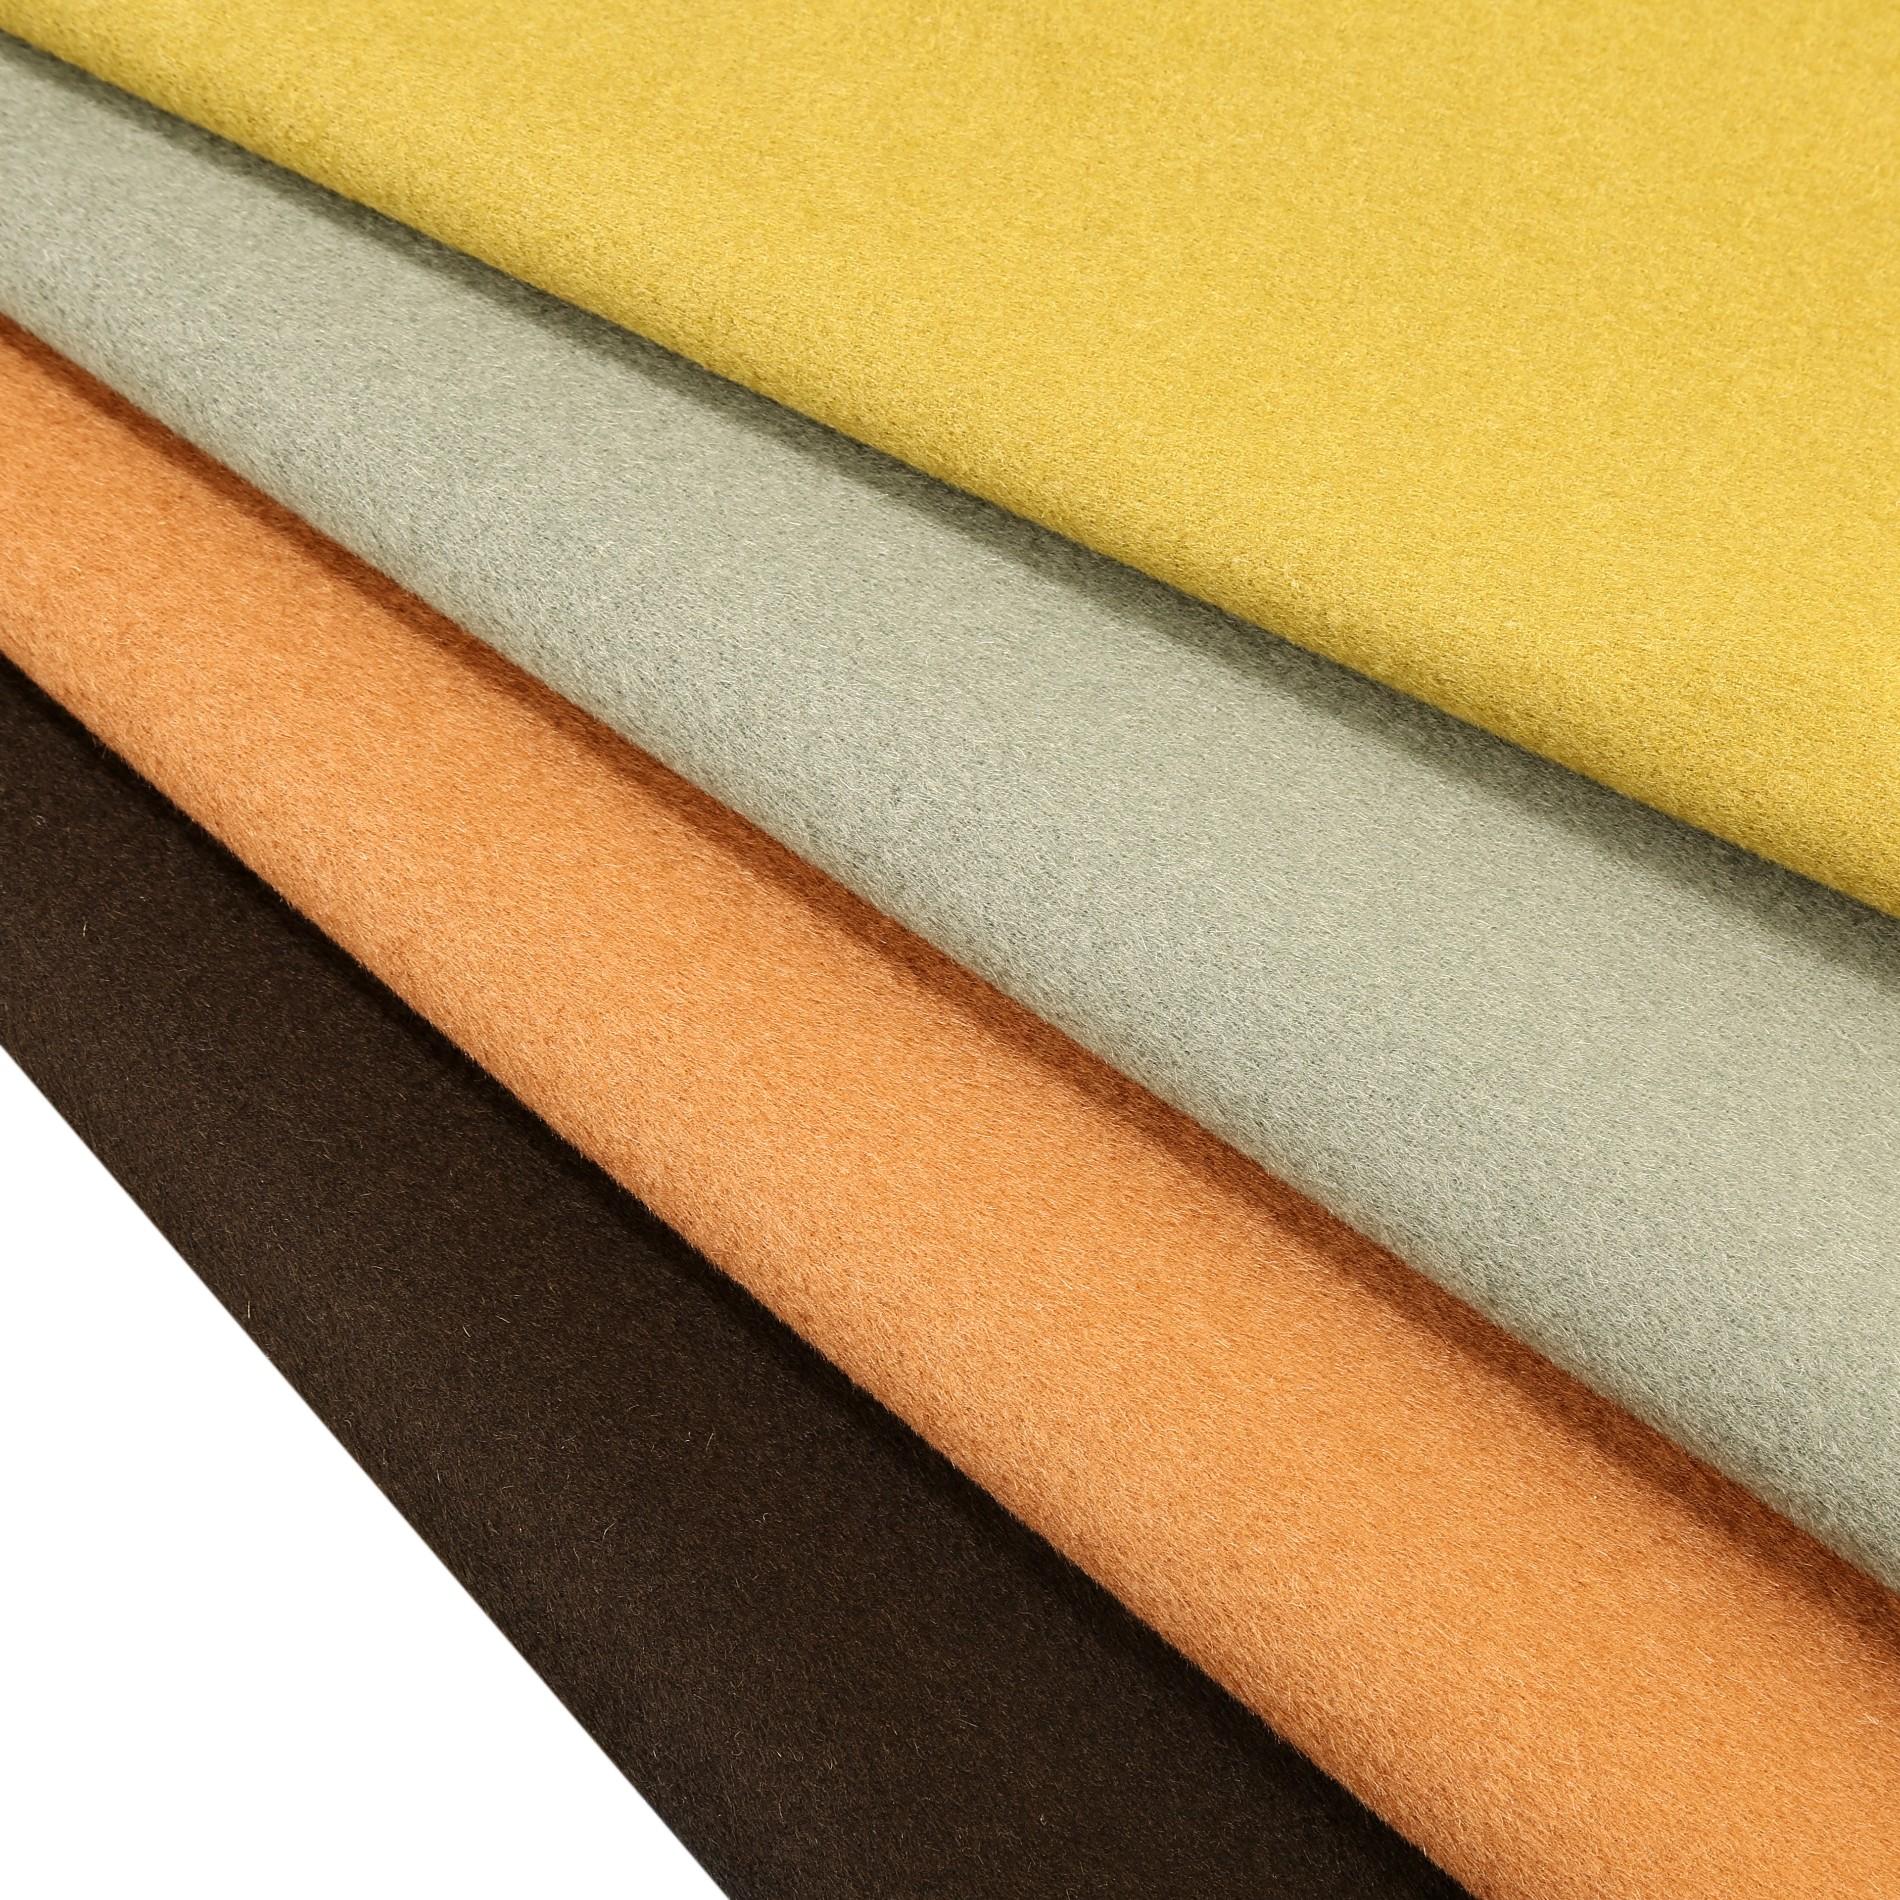 Woolen Overcoating Fabric Colors Manufacturers, Woolen Overcoating Fabric Colors Factory, Supply Woolen Overcoating Fabric Colors